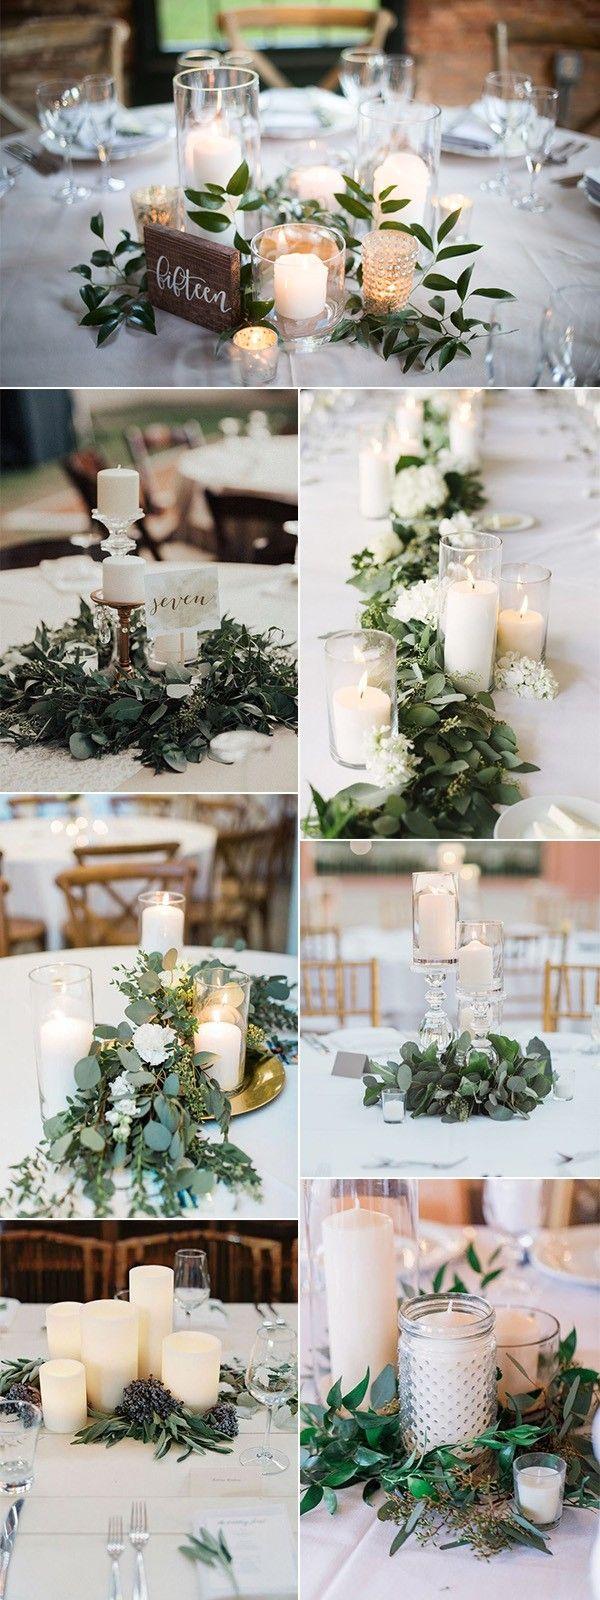 25 Budget Friendly Simple Wedding Centerpiece Ideas With Candles Emmalovesweddings Simple Wedding Centerpieces Elegant Wedding Centerpiece Wedding Centerpieces